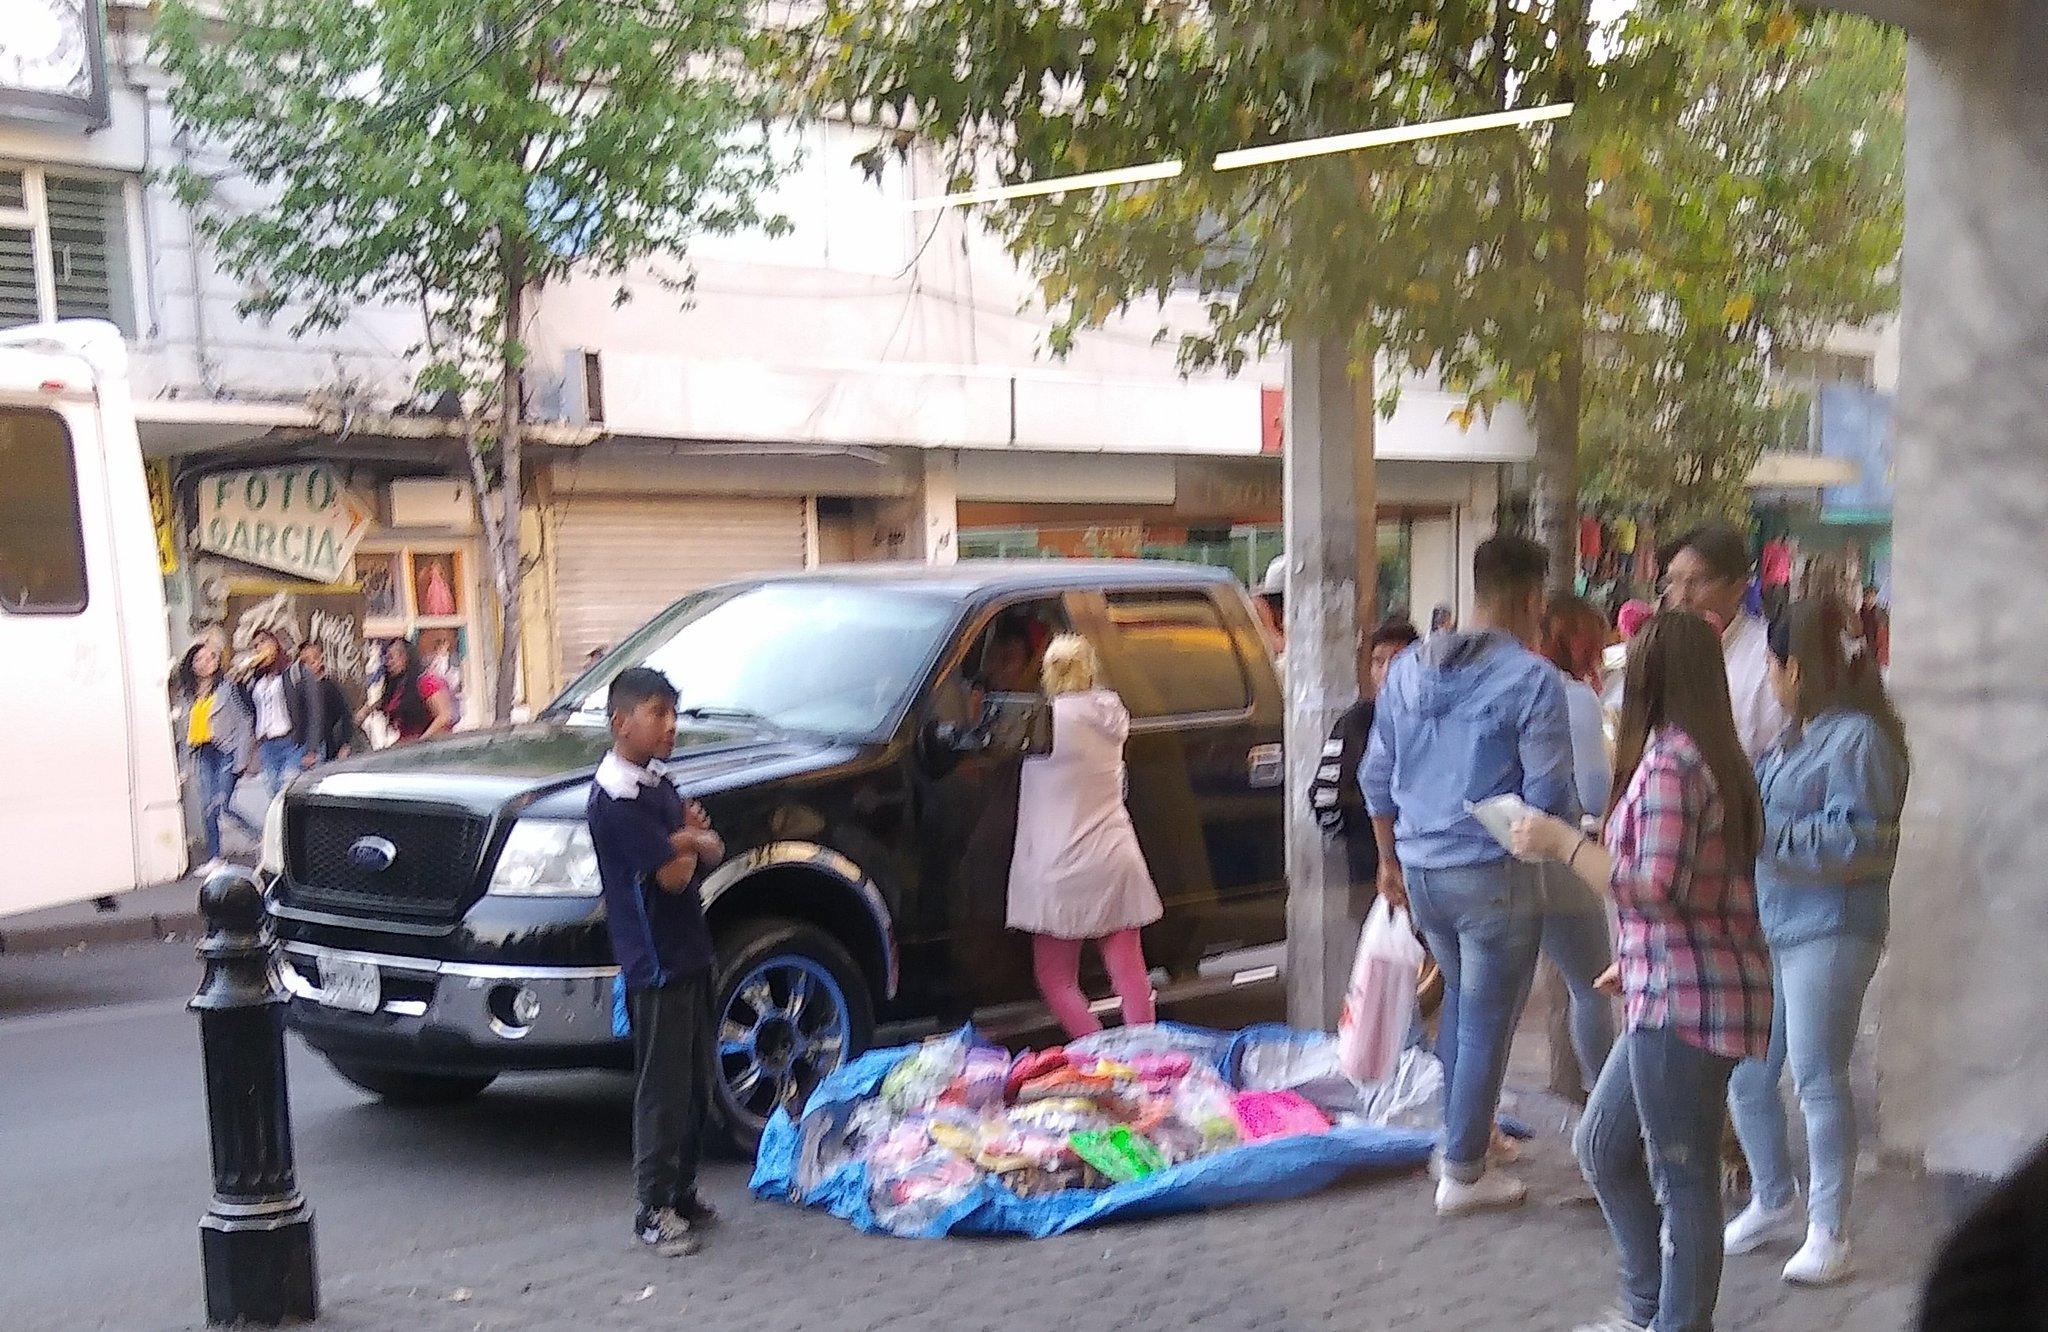 Regresan-los-ambulantes-al-centro-de-Toluca